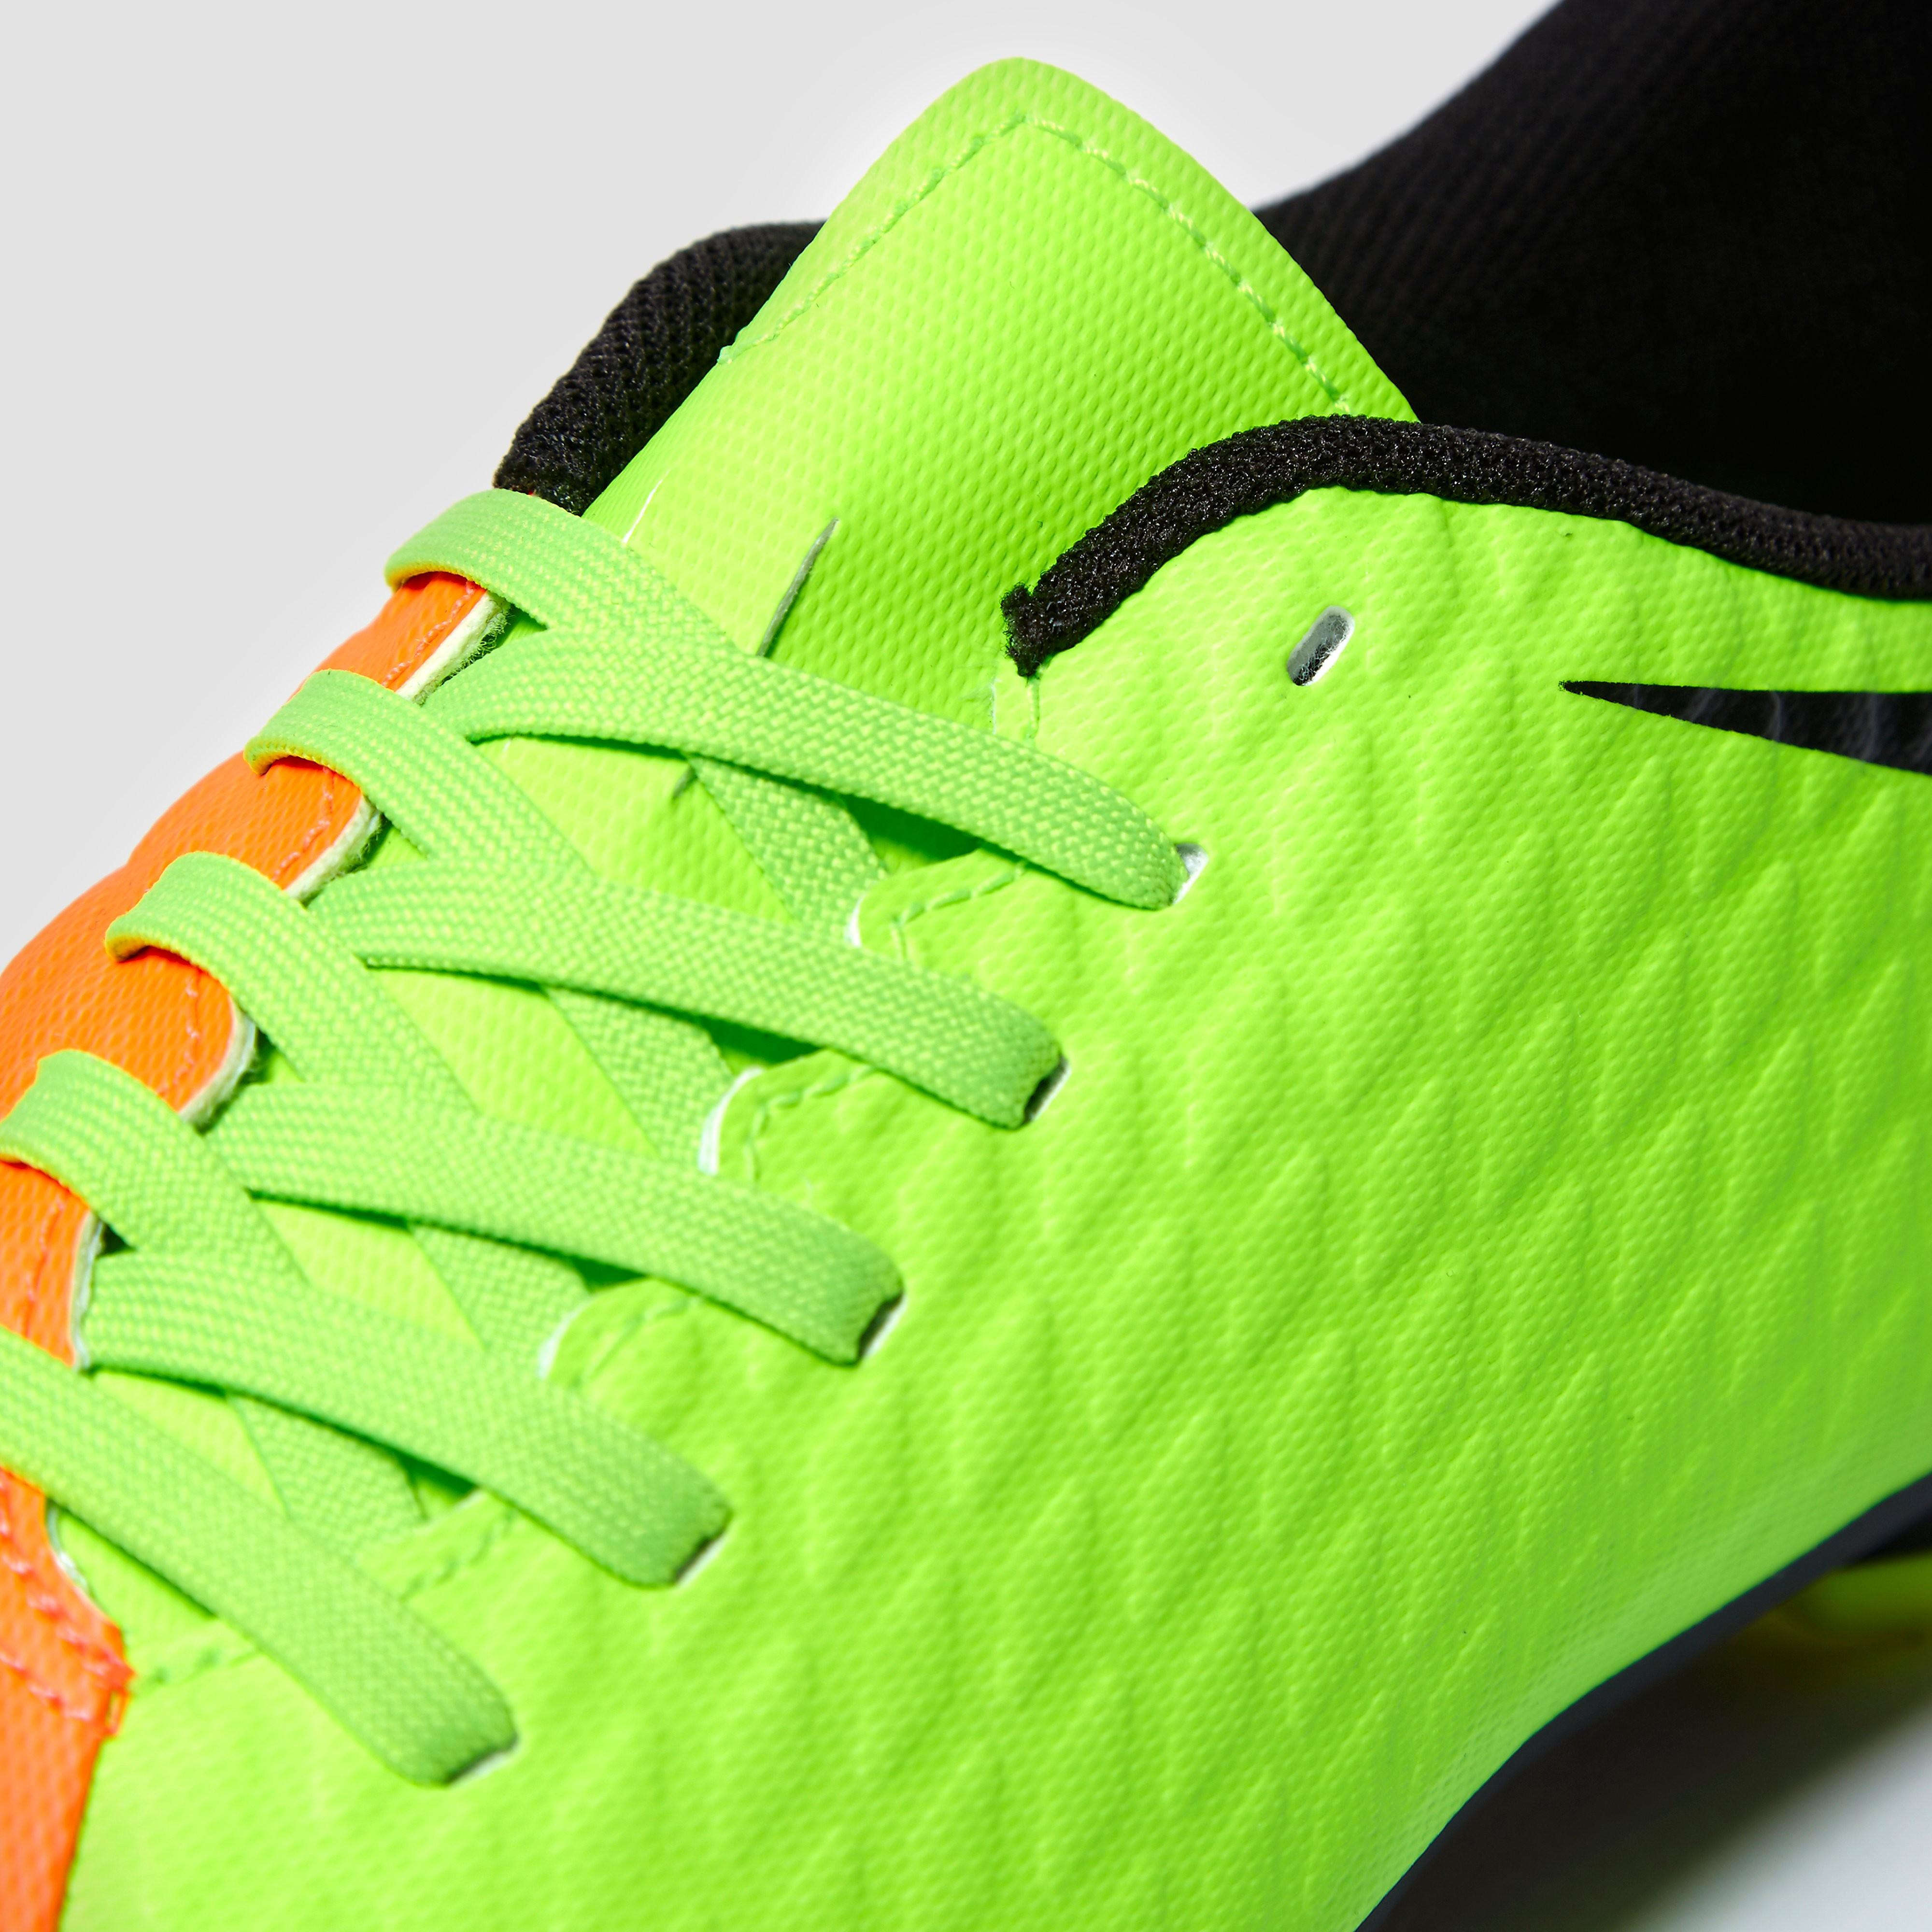 Nike Radiation Flare Hypervenom Phade II FG Children